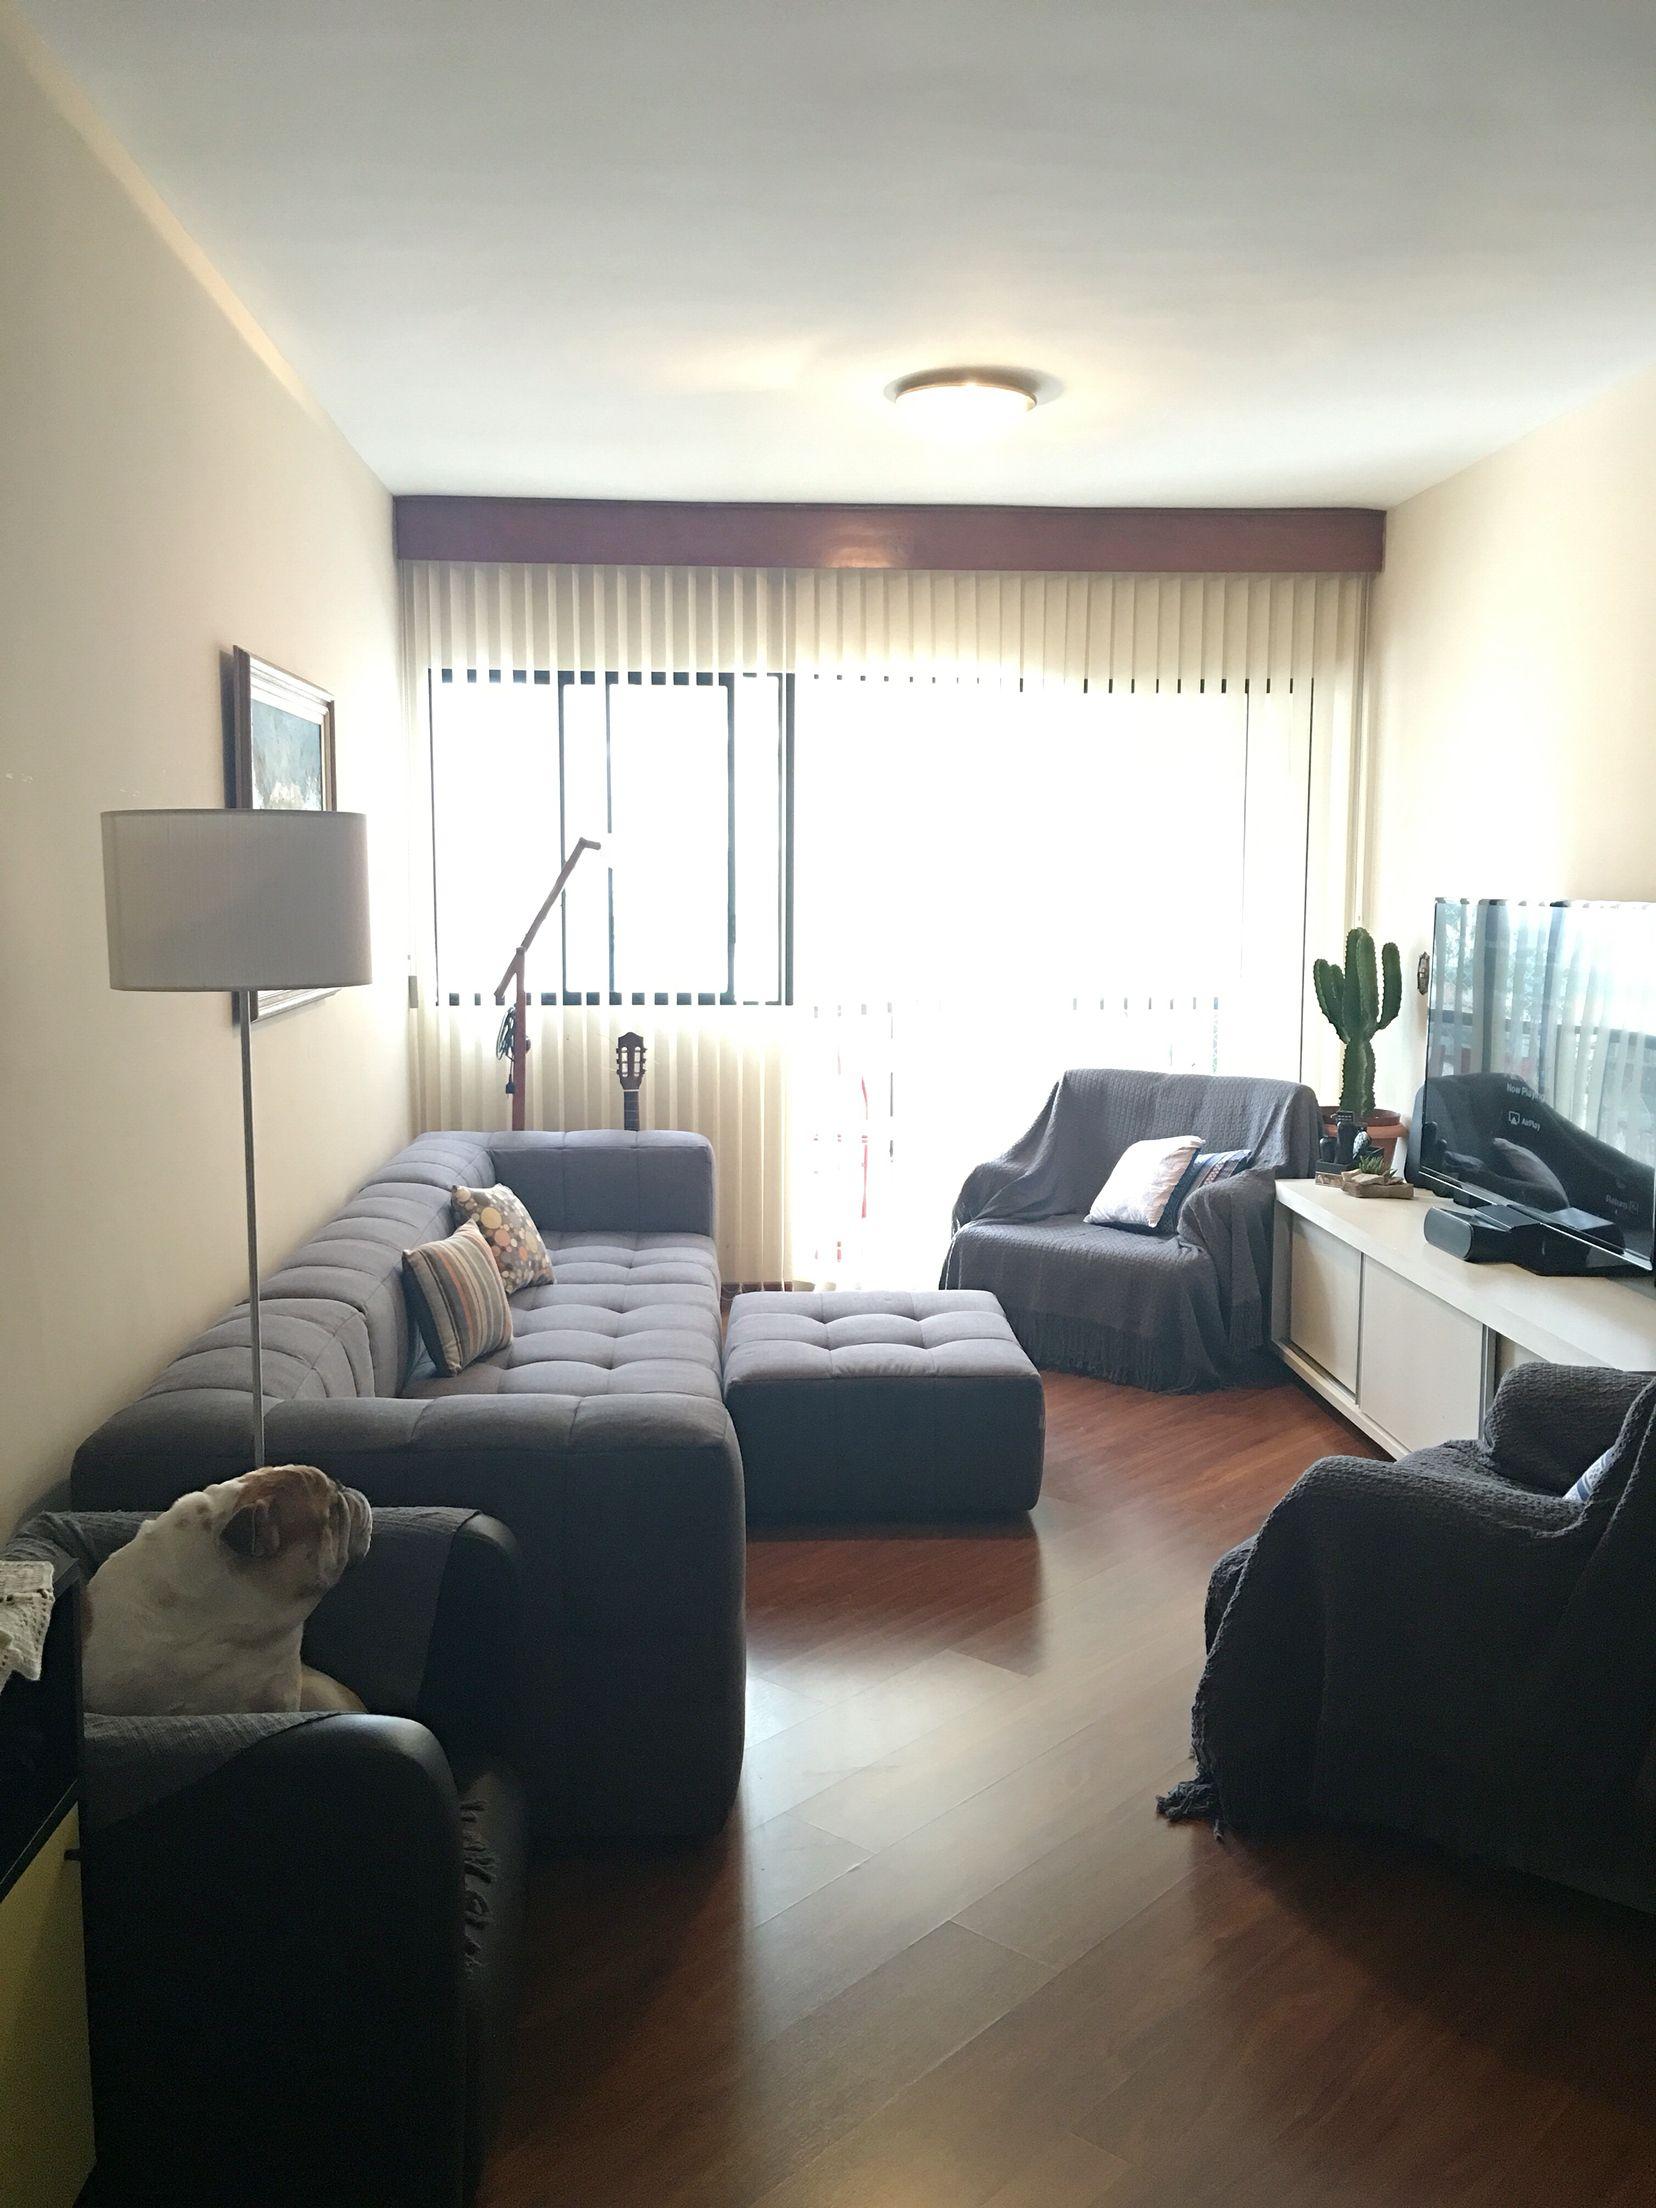 Apartment goals also best images industrial loft home decor rh pinterest